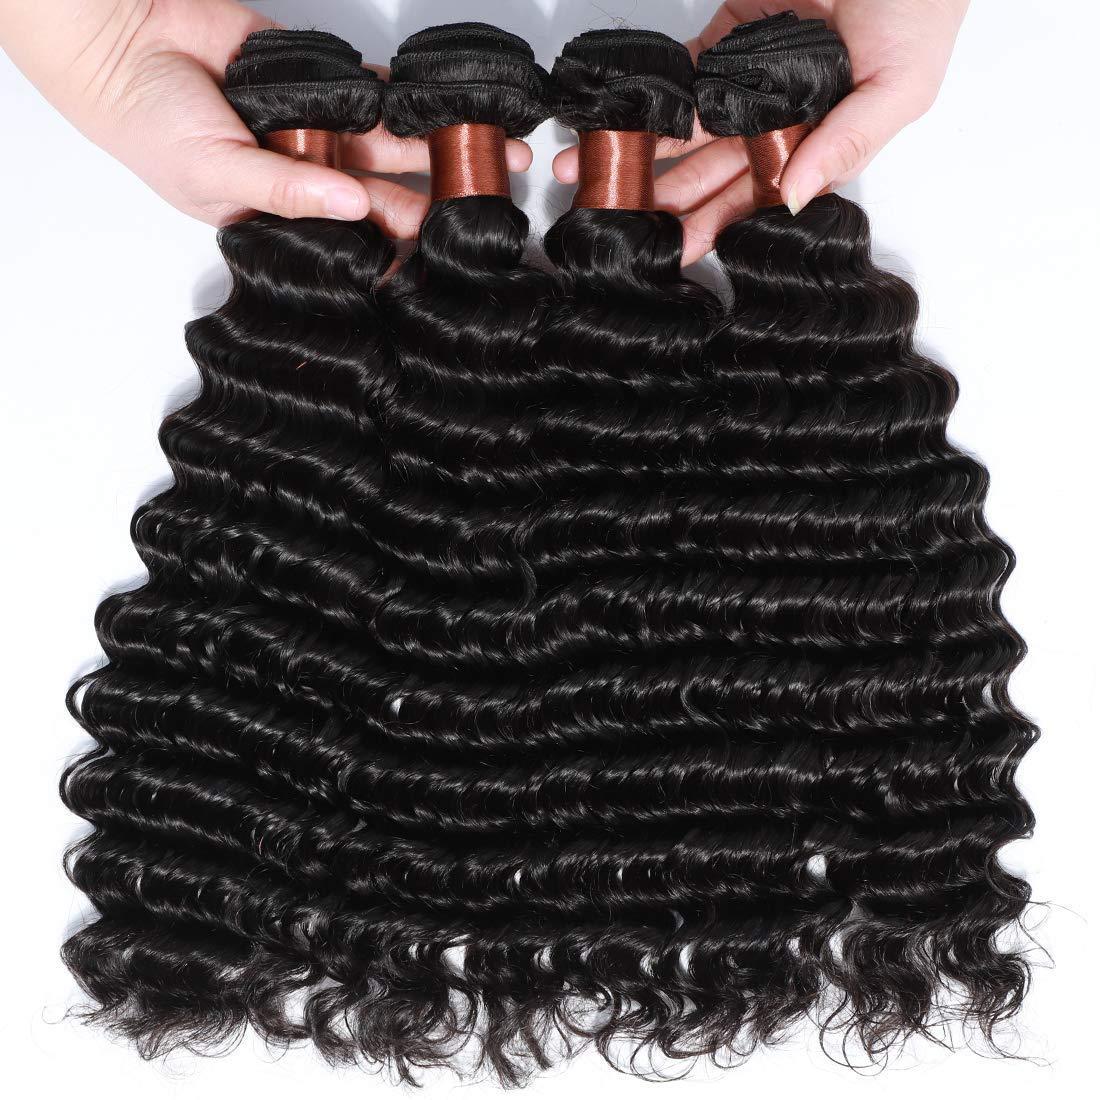 ANGIE QUEEN 特価 Peruvian ◆セール特価品◆ Virgin Hair 100% Unproces Bundles Wave Deep